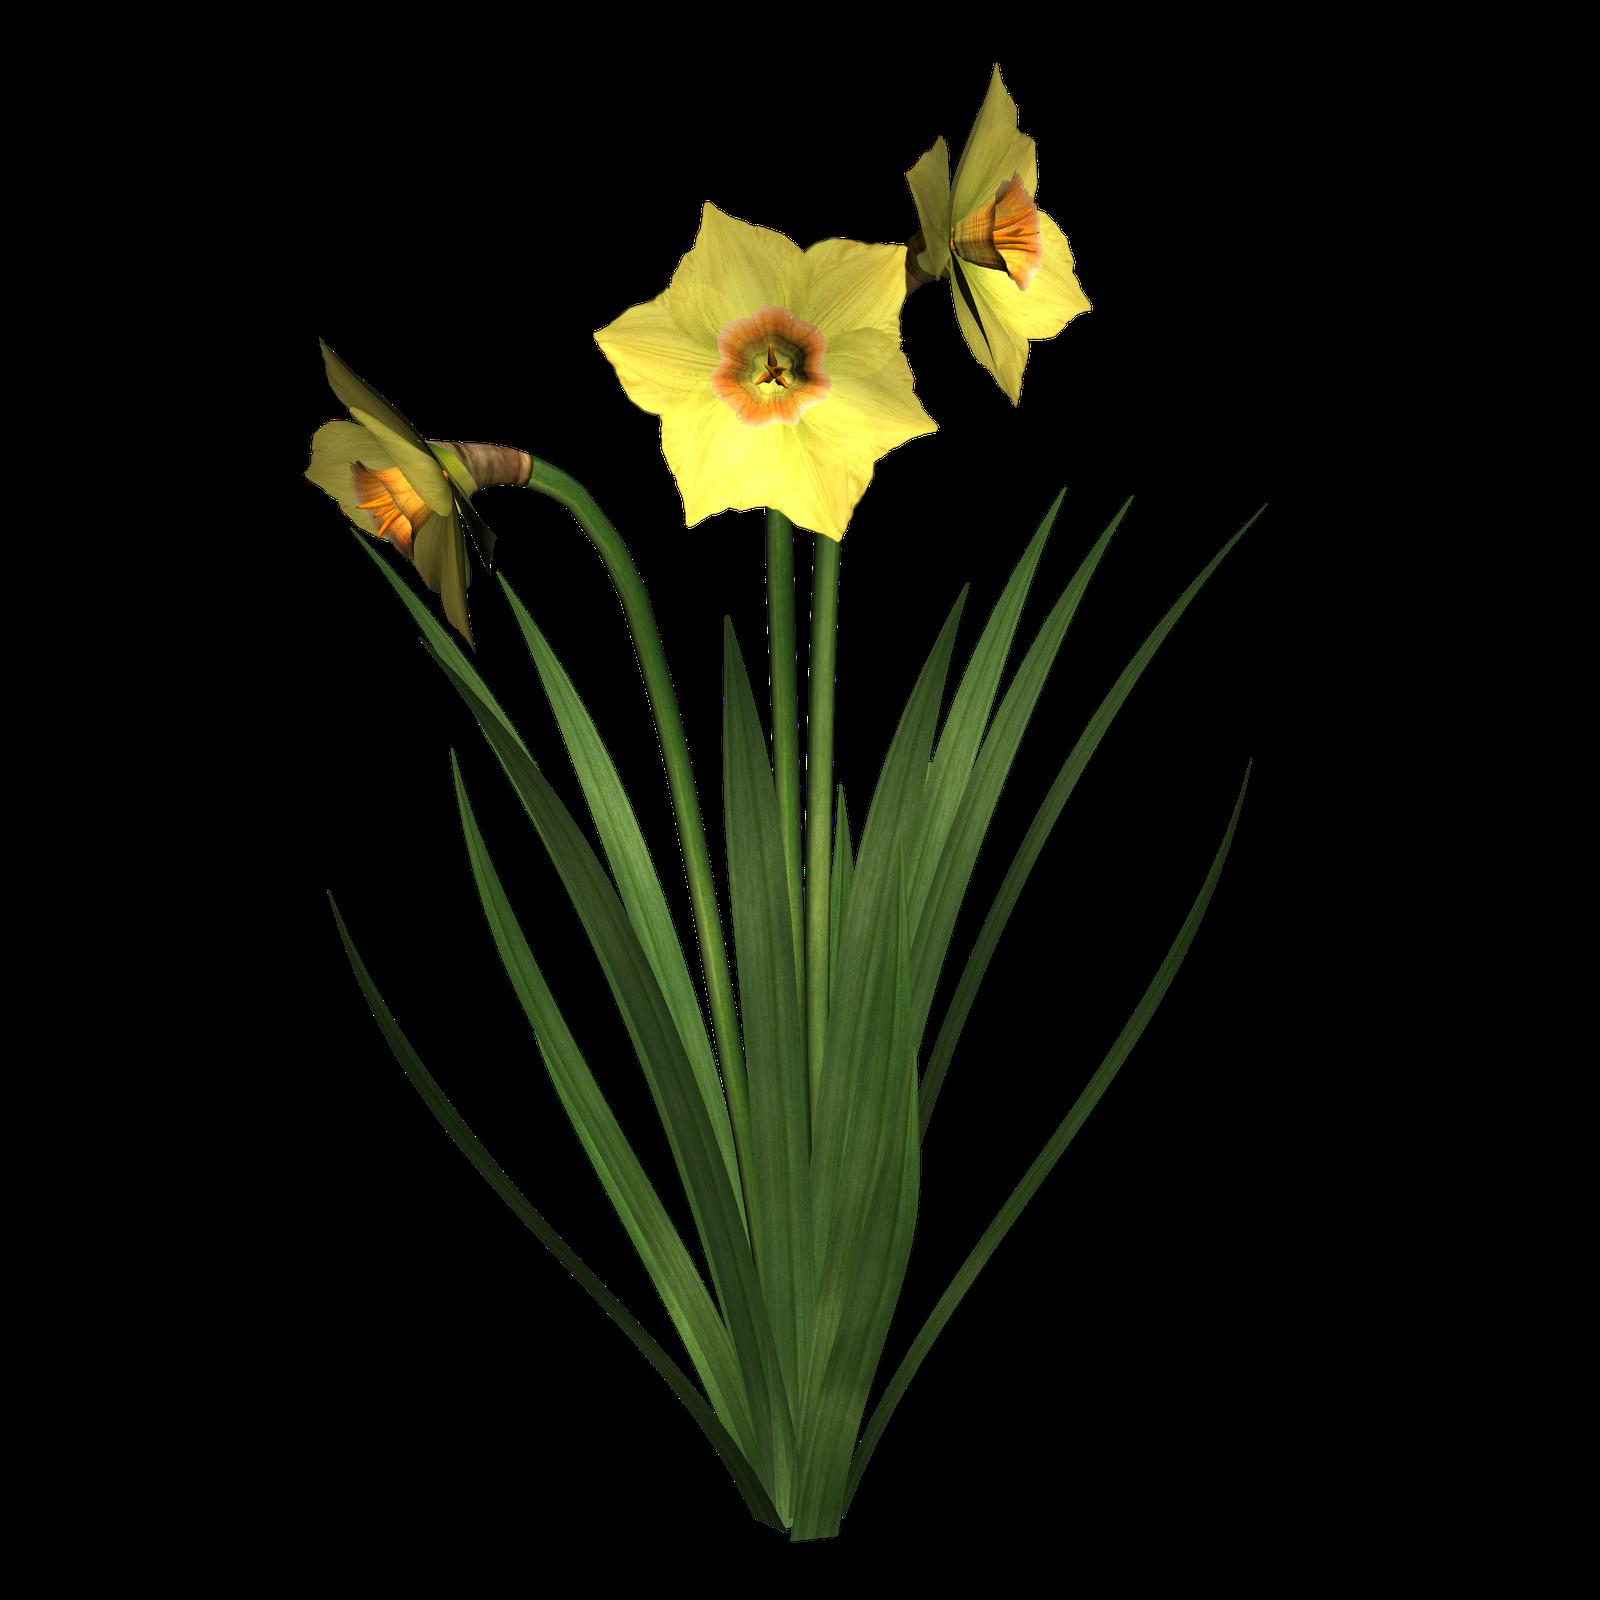 Flower at getdrawings com. Clipart borders daffodil